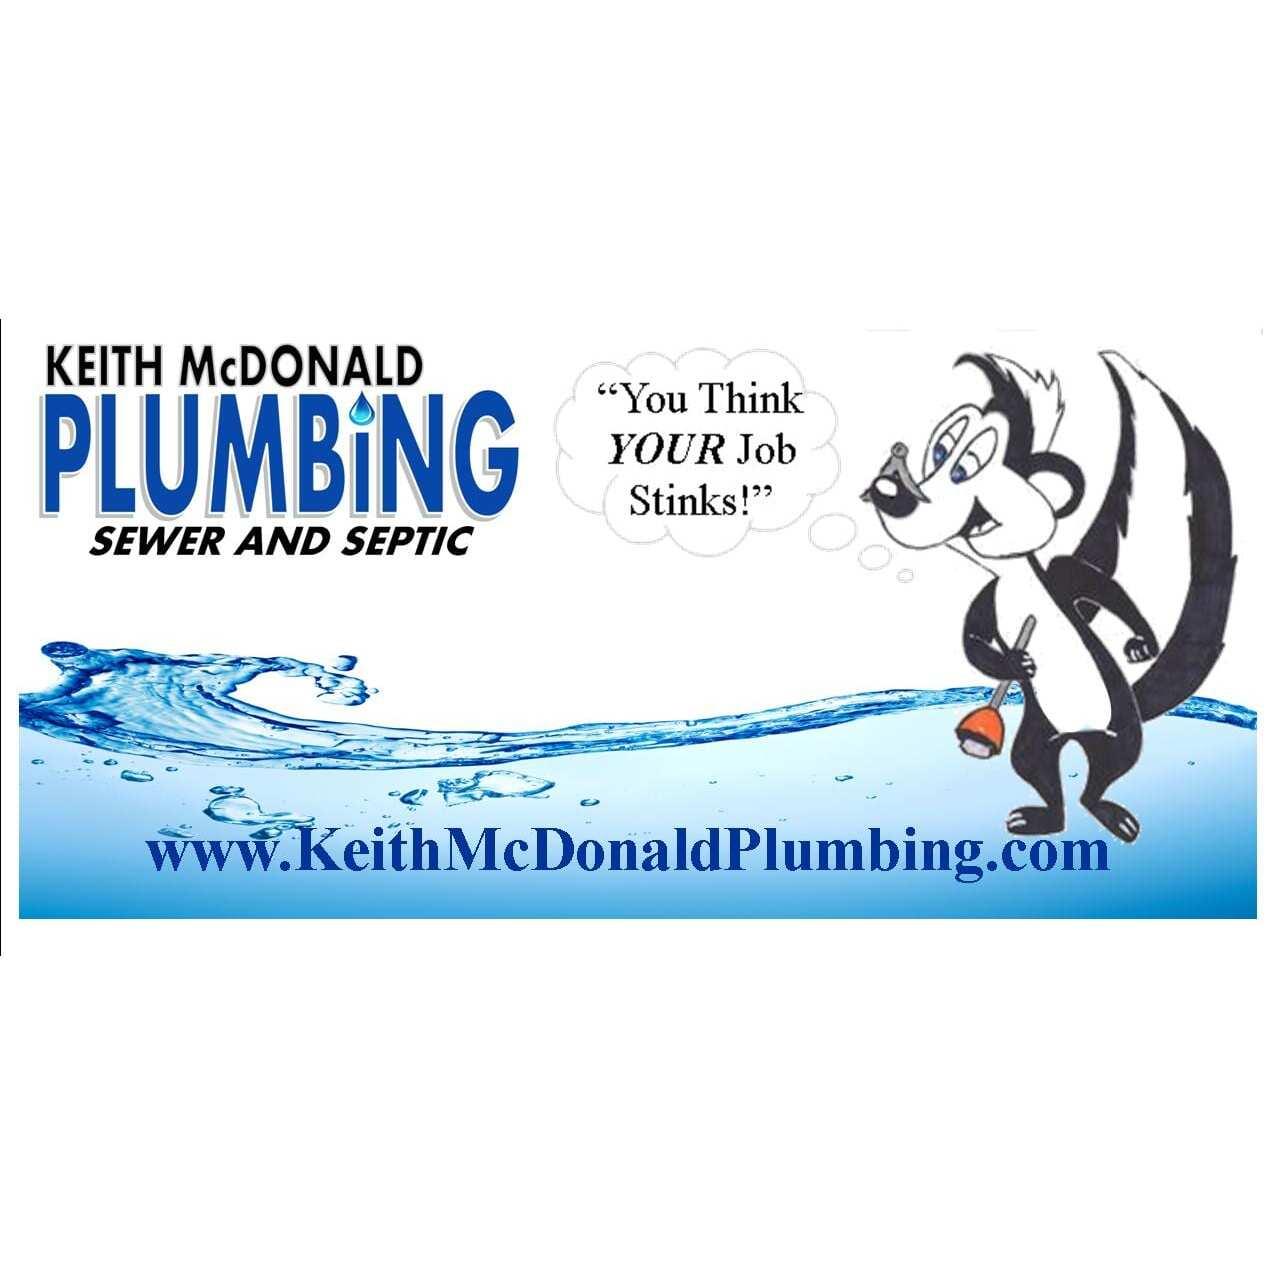 Keith McDonald Plumbing Sewer & Septic